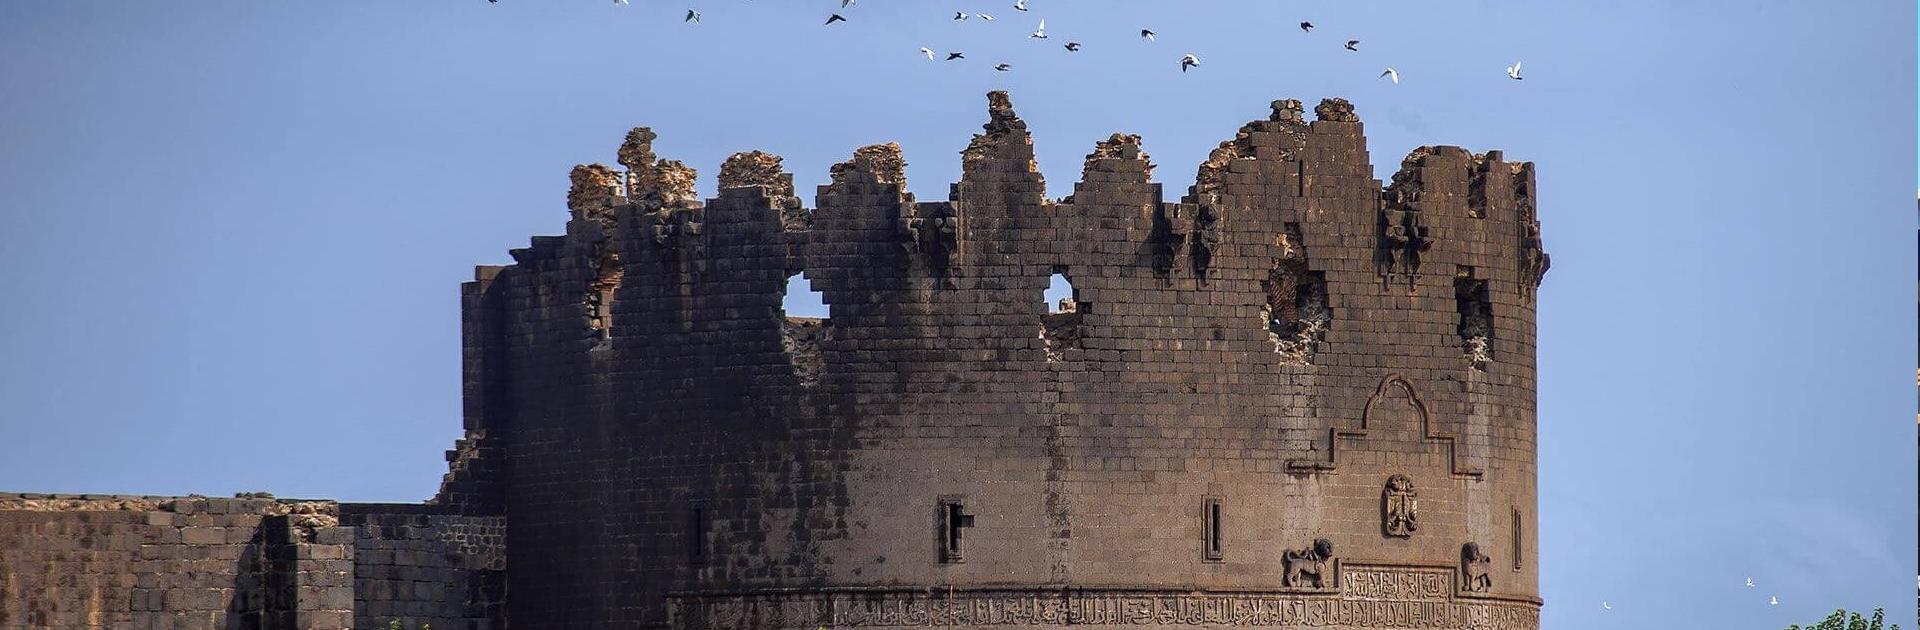 Diyarbakır Surları